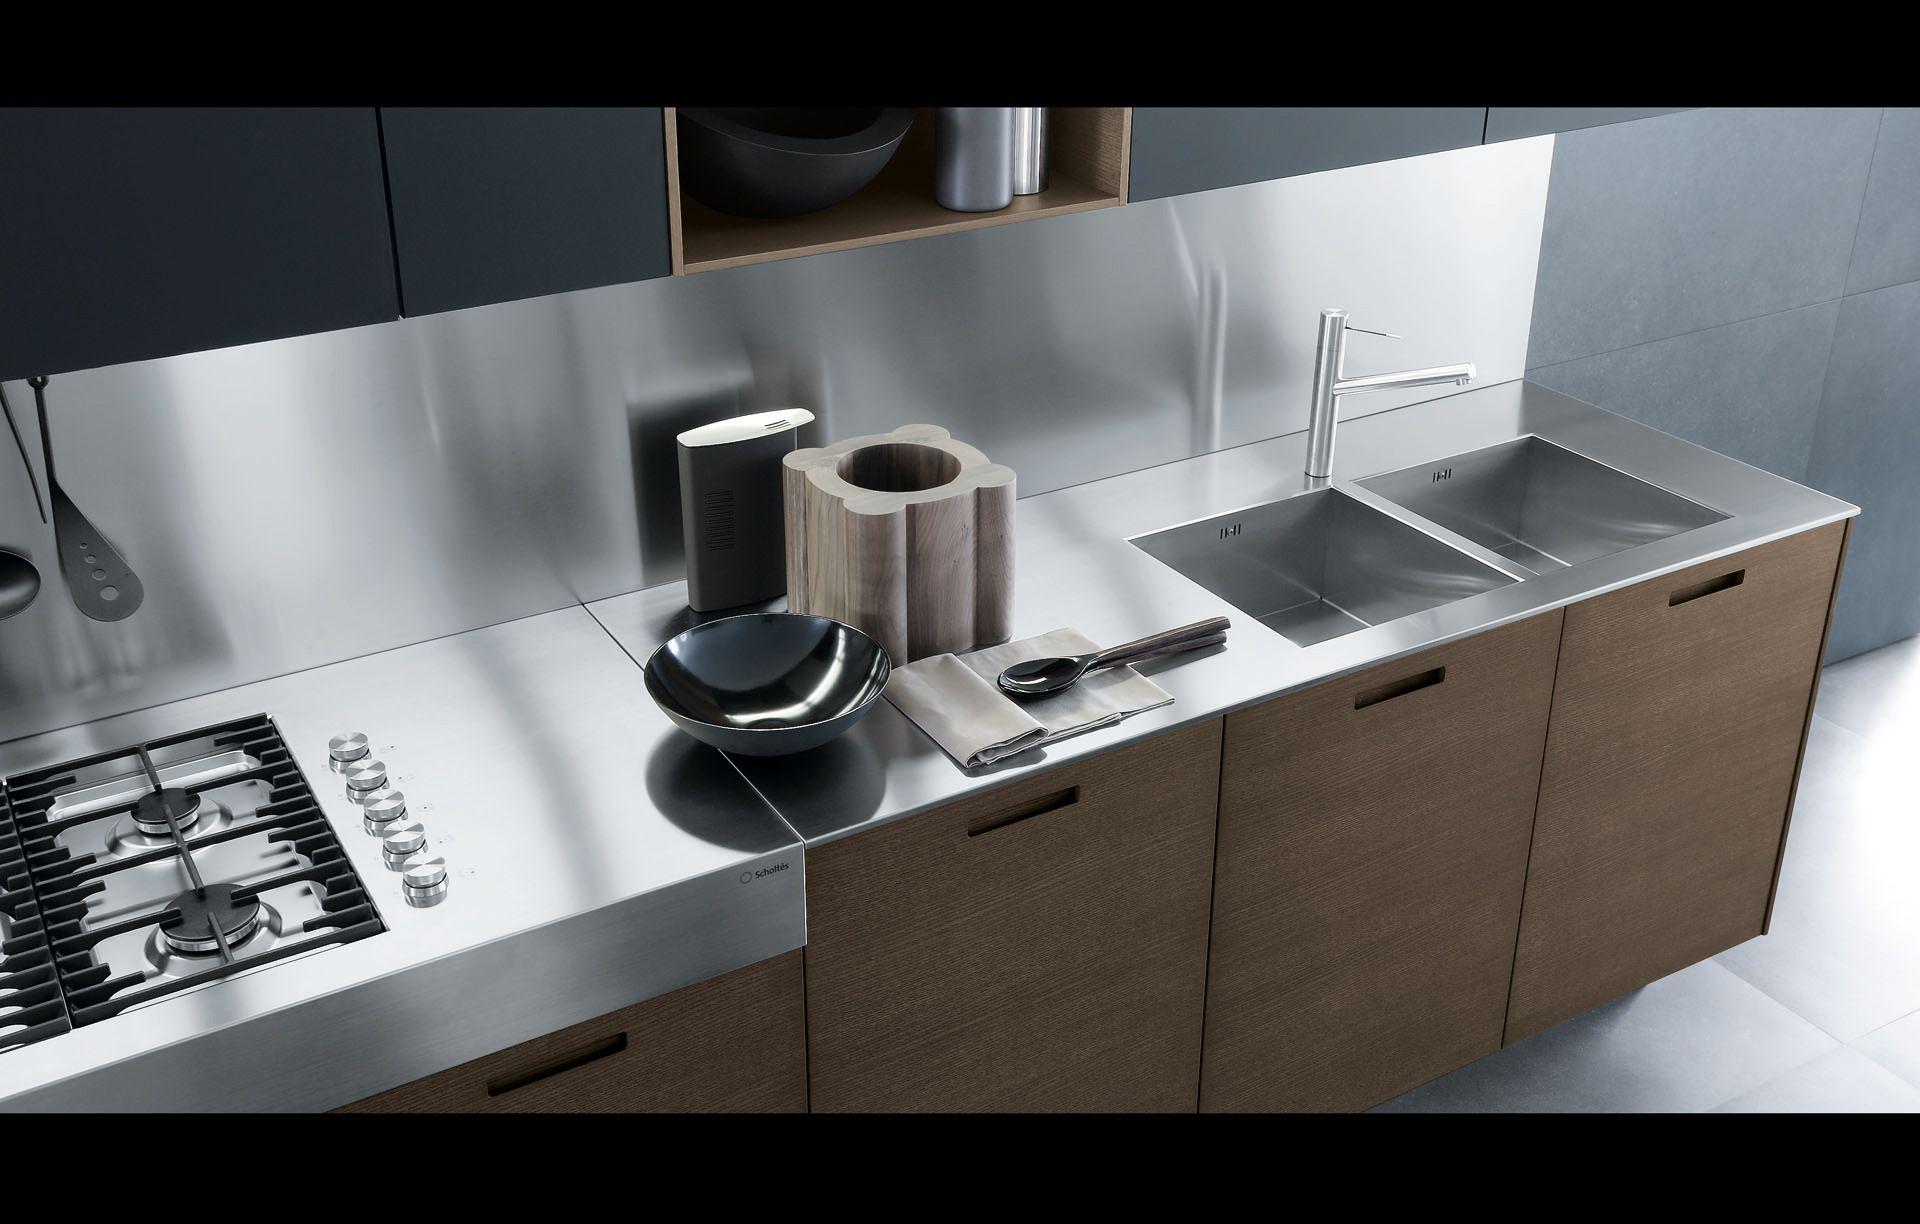 KYTON KITCHEN CABINETRY Designed by Poliform | kitchen | Pinterest ...